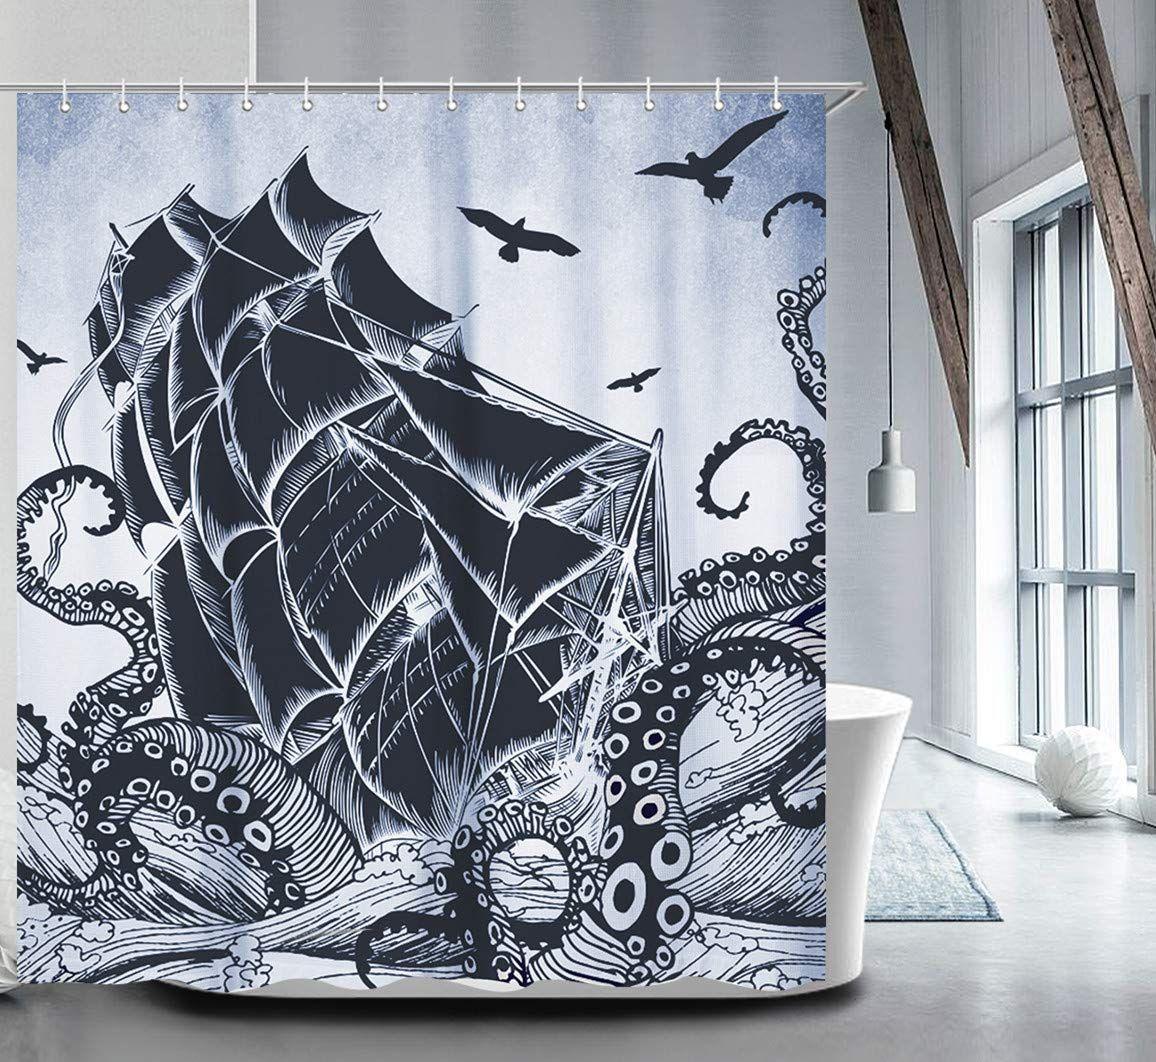 Livilan Nautical Shower Curtain Set With 12 Hooks Kraken Bathroom